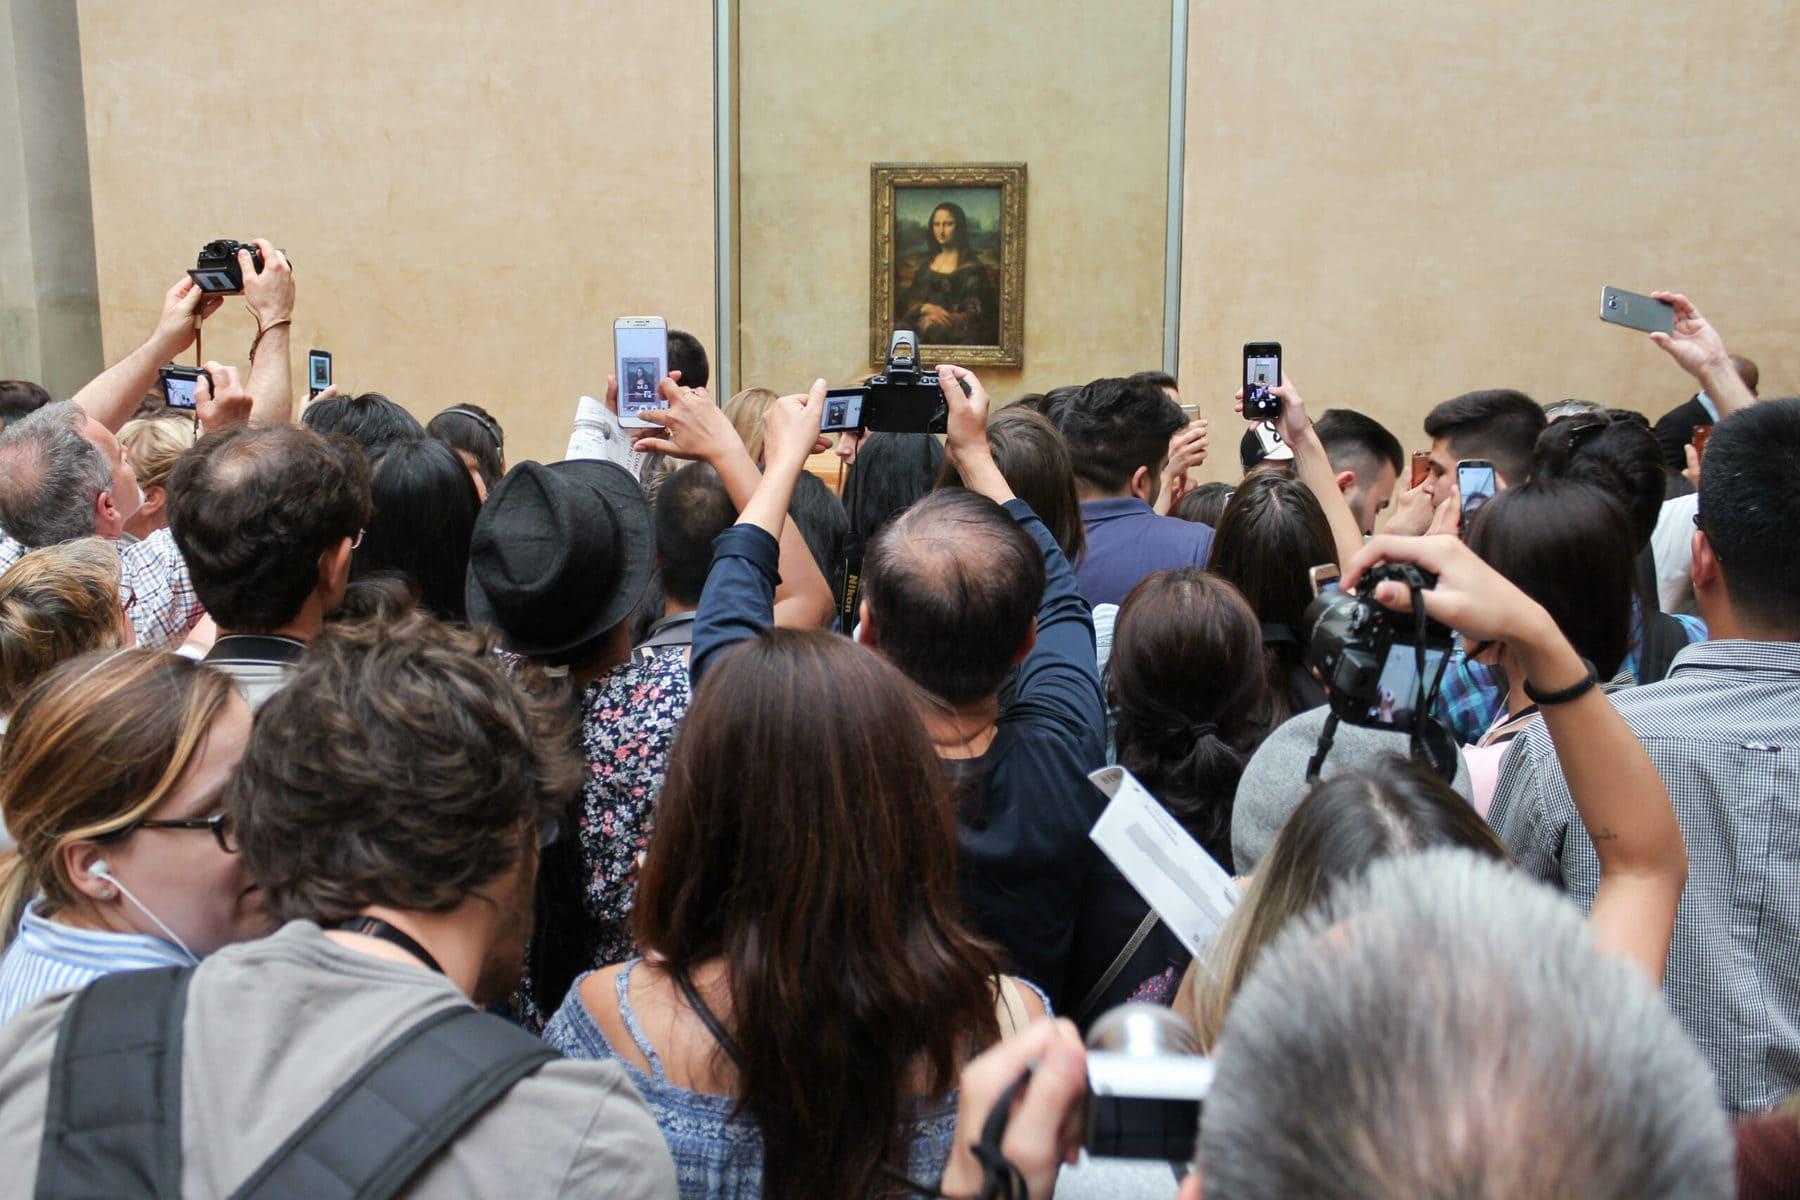 Mona Lisa, Besucher, Paris